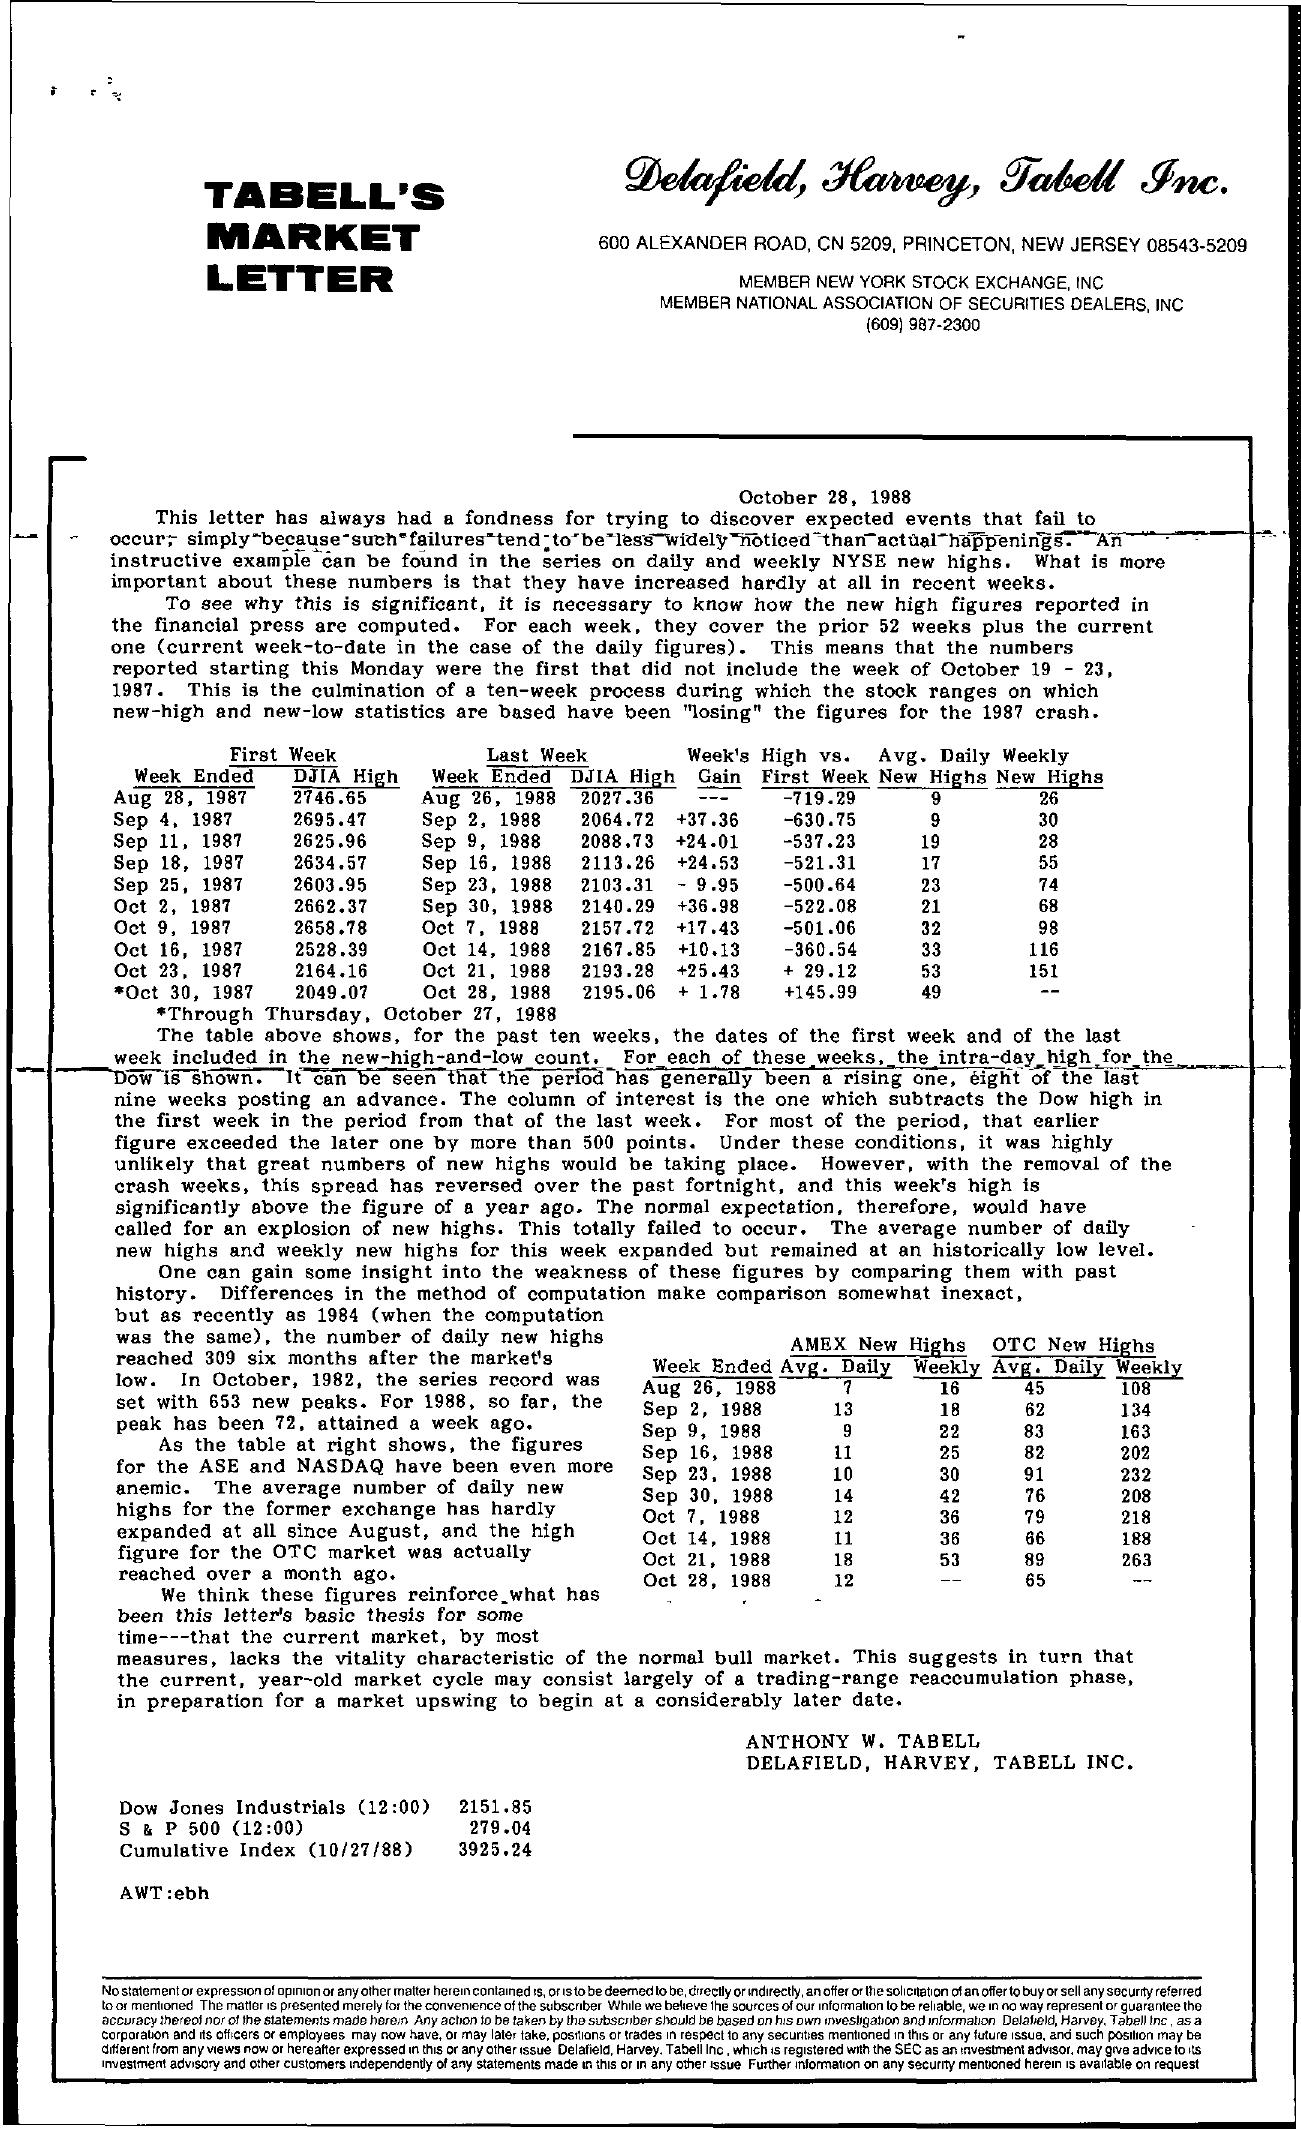 Tabell's Market Letter - October 28, 1988